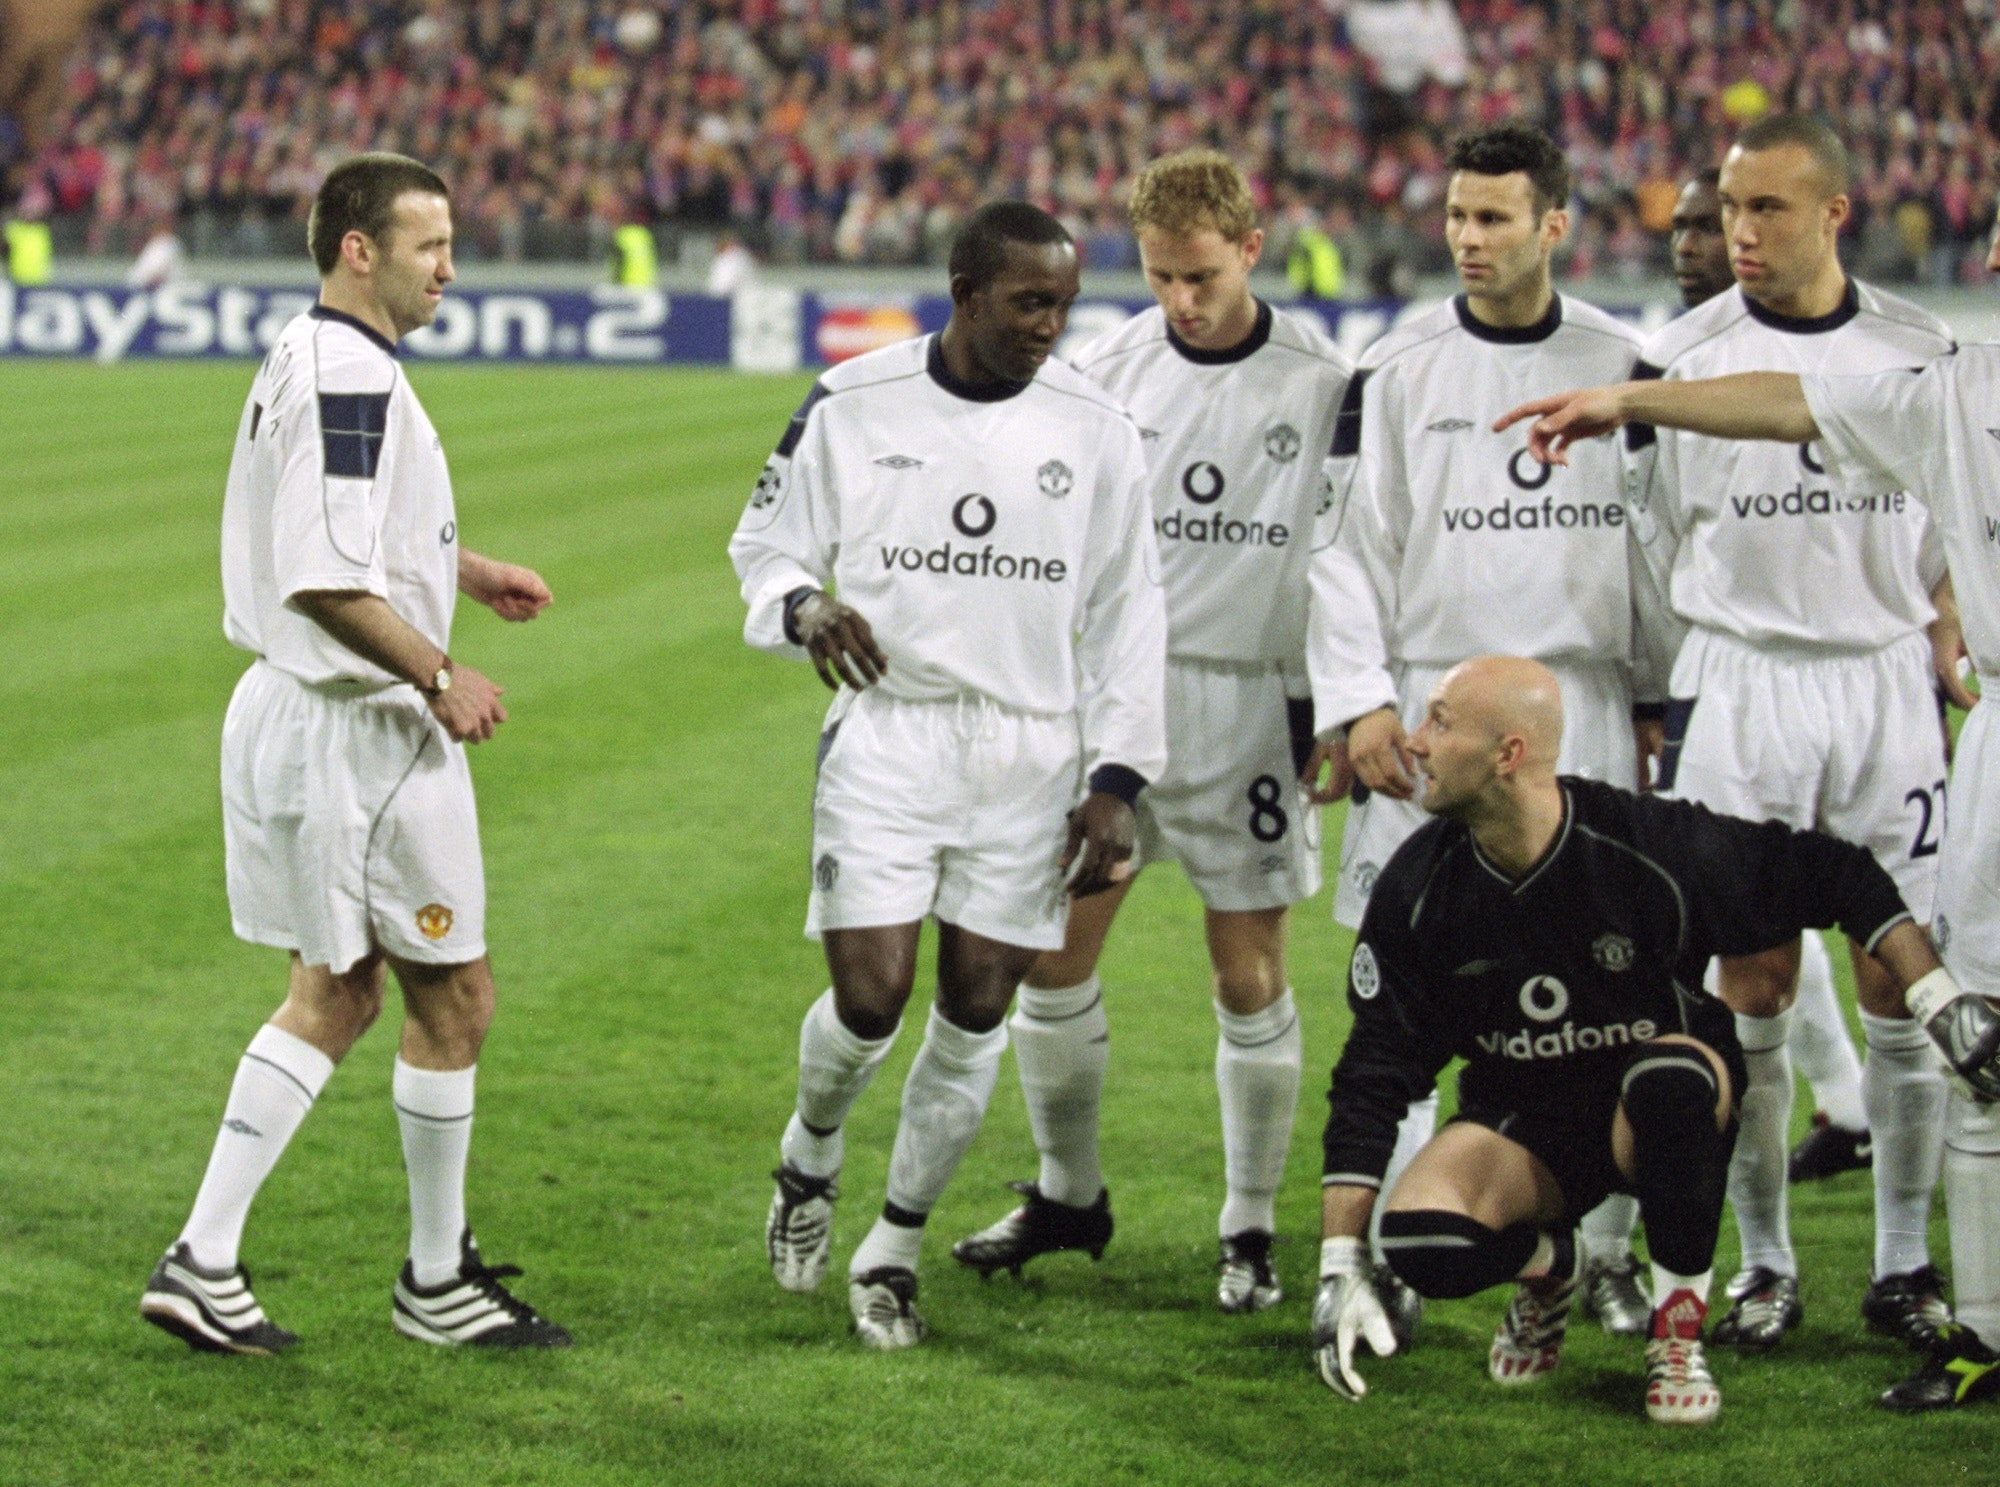 Karl Power - Manchester United